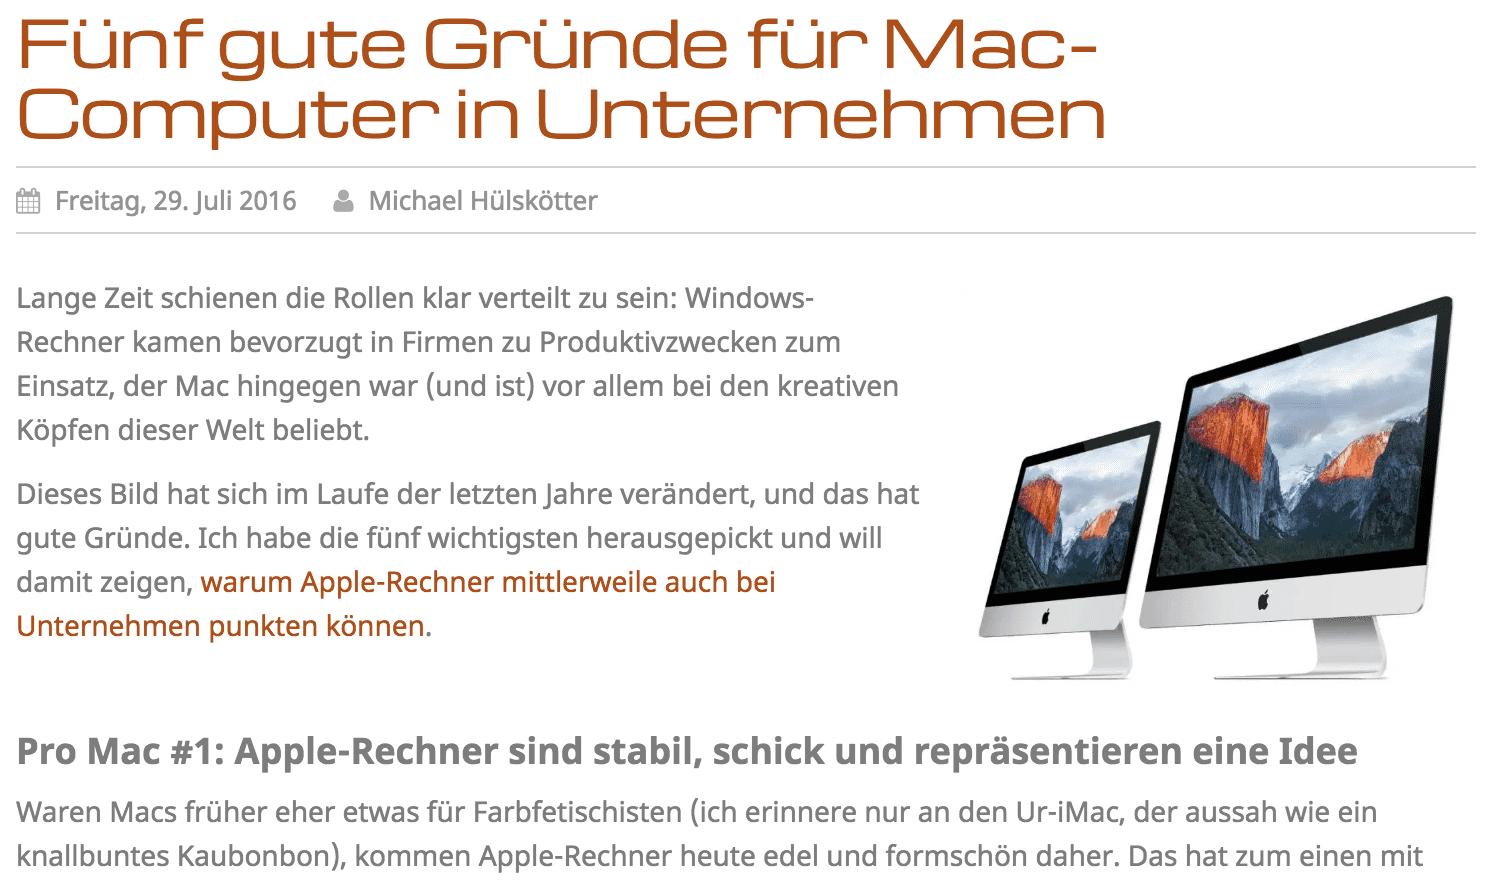 Macs in Unternehmen